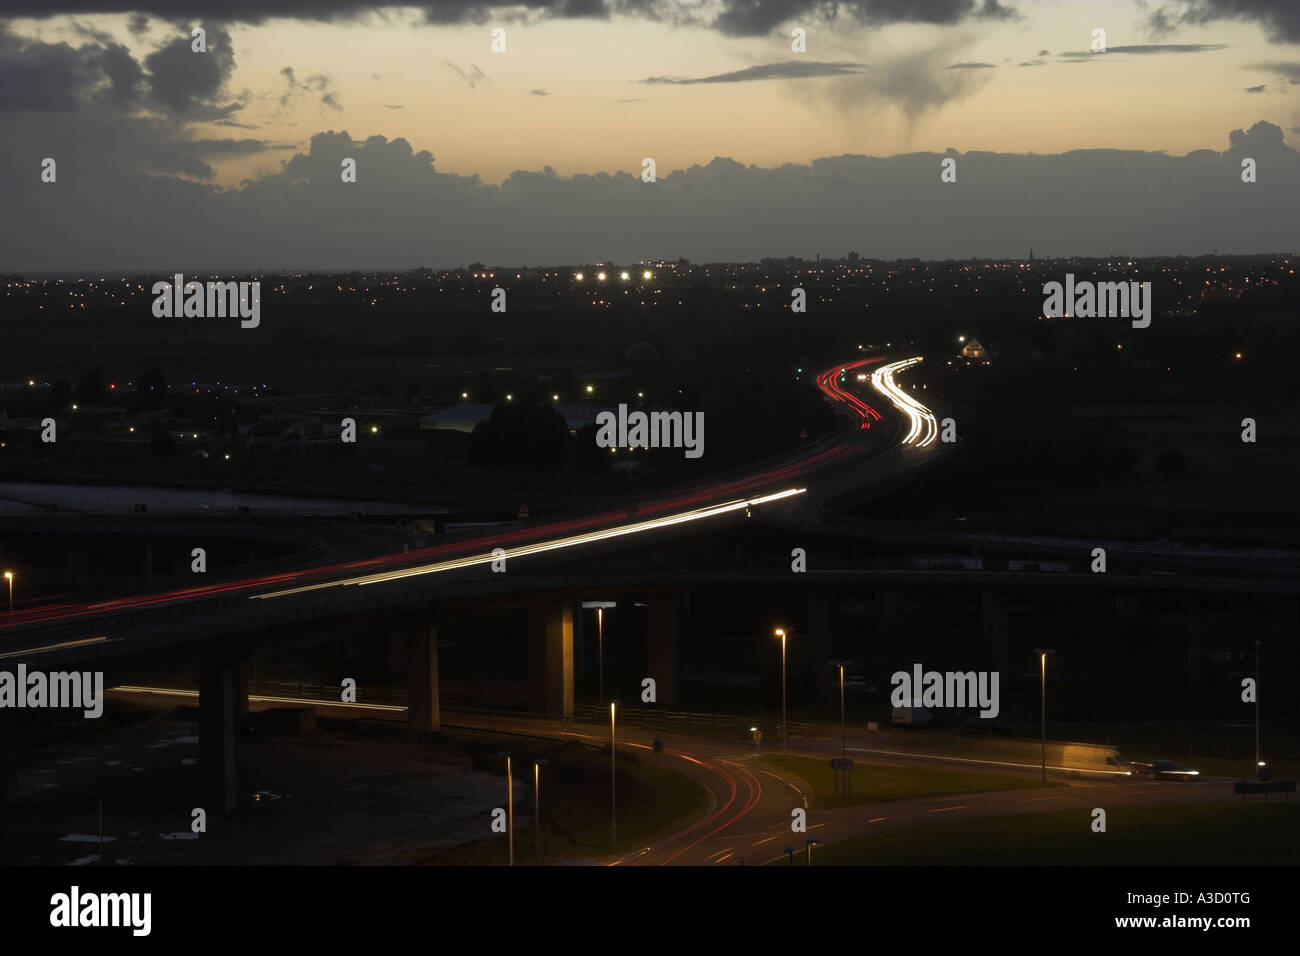 Light trails on the A27 Shoreham flyover / interchange - Shoreham by Sea, West Sussex, UK. Stock Photo